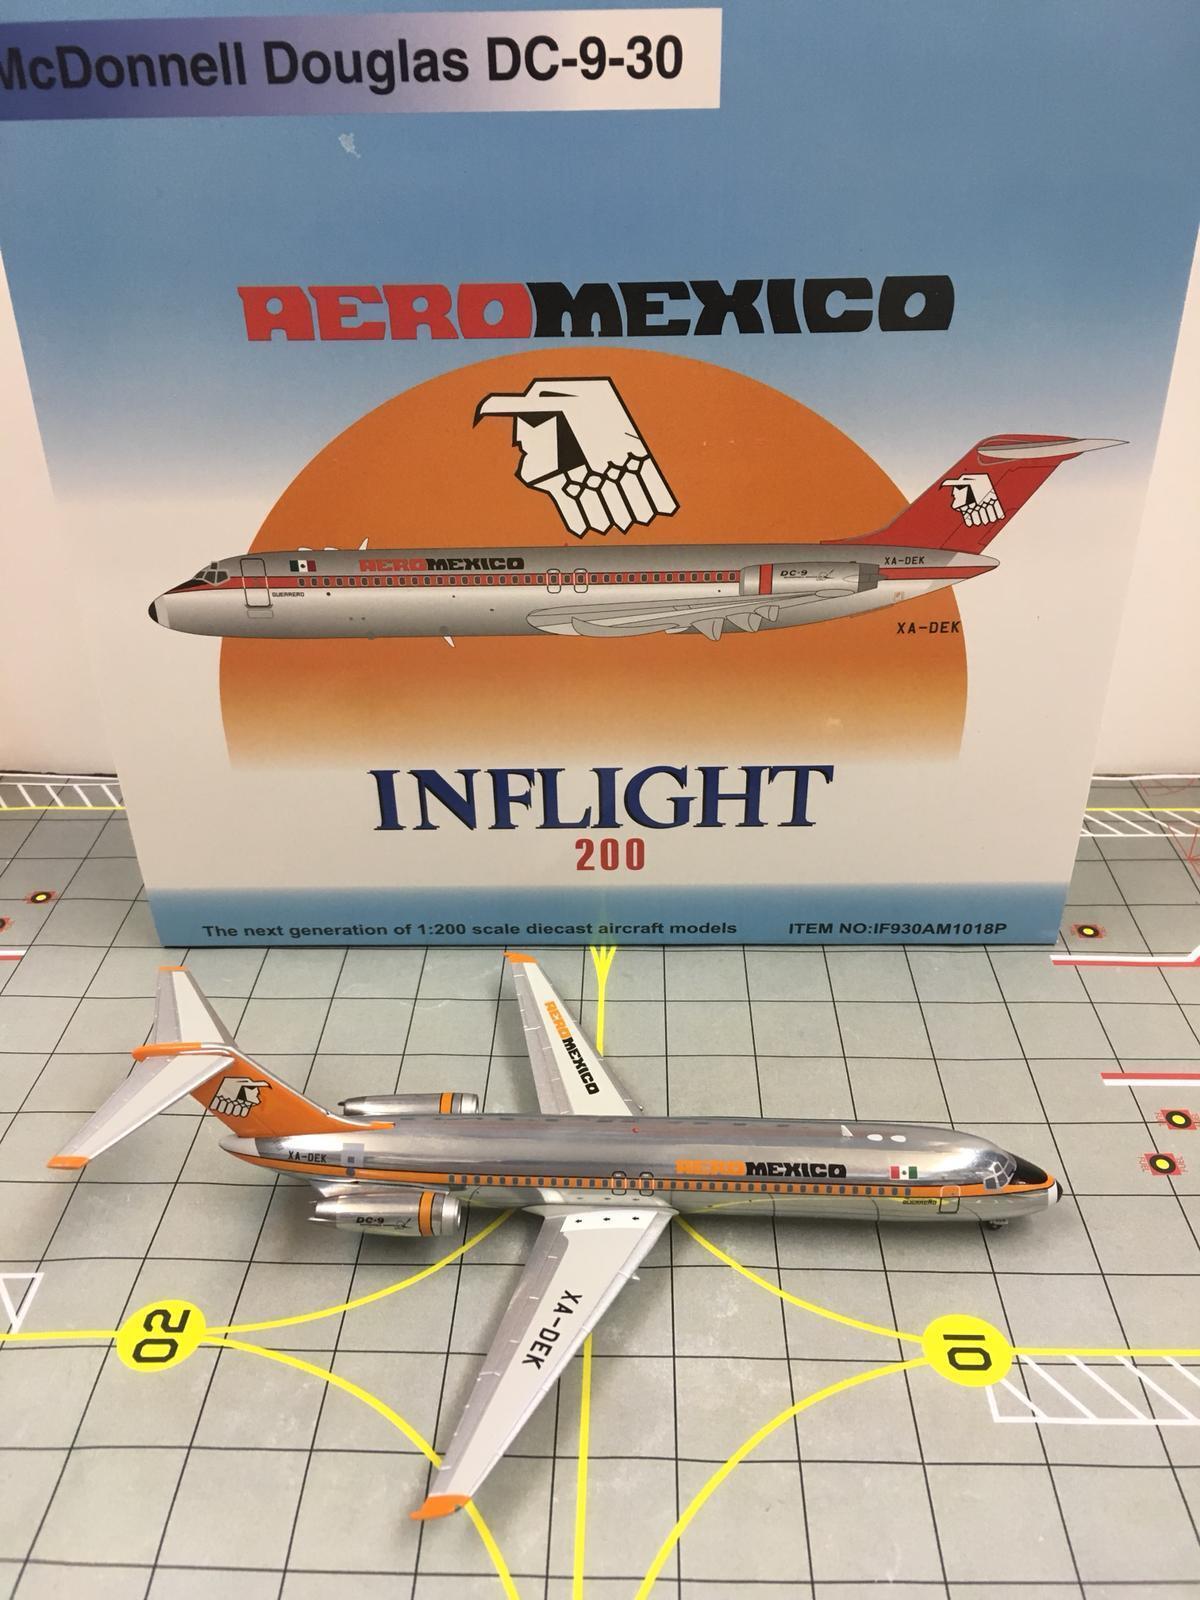 InFlight 200 1 200 200 200 IF930AM1018P AEROMEXICO McDonnell Douglas DC-9-30 XA-DEK e38e30